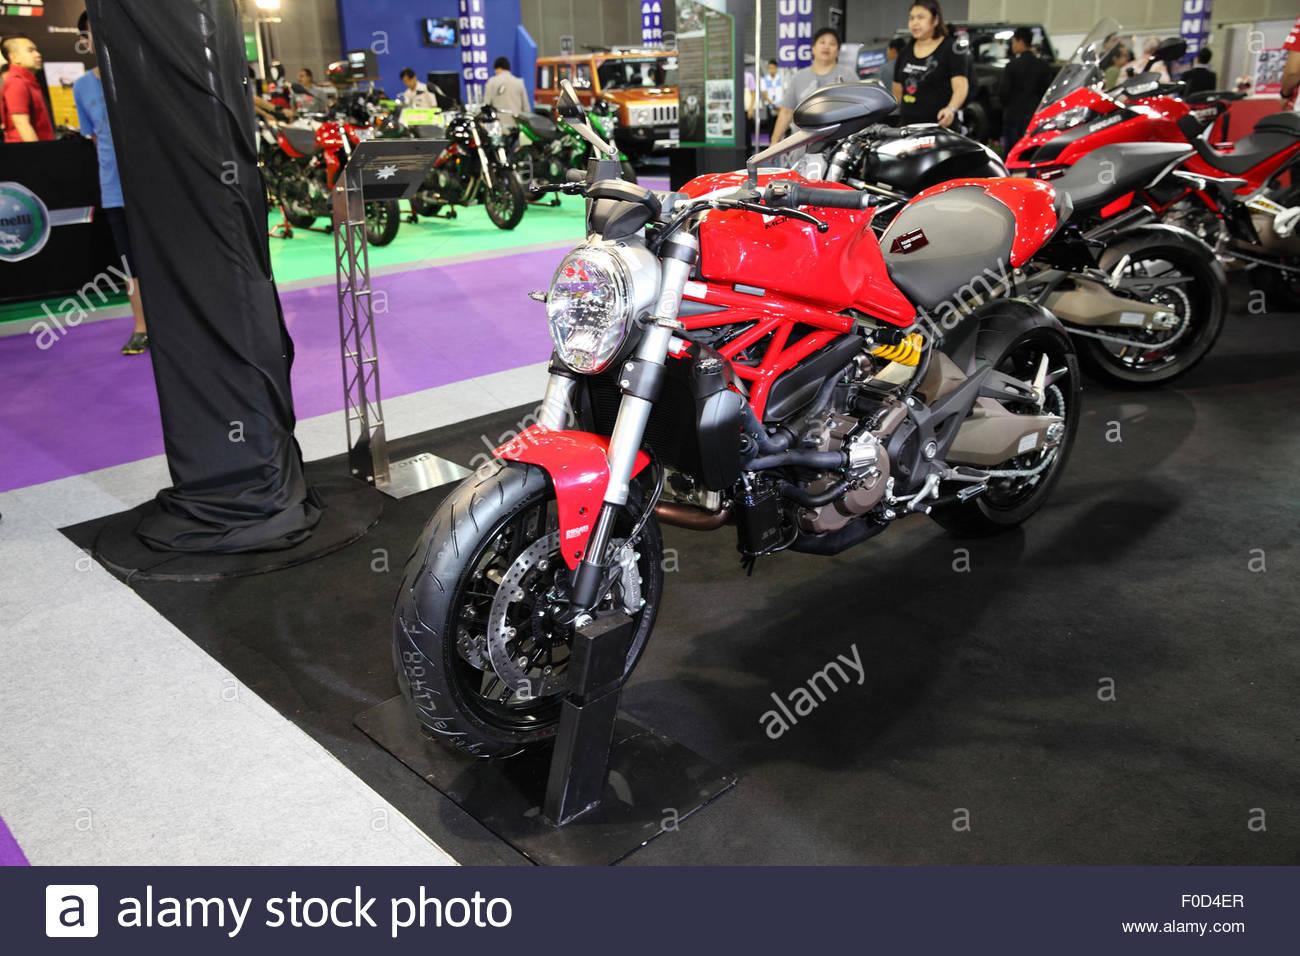 Ducati Monster Imágenes De Stock & Ducati Monster Fotos De Stock - Alamy